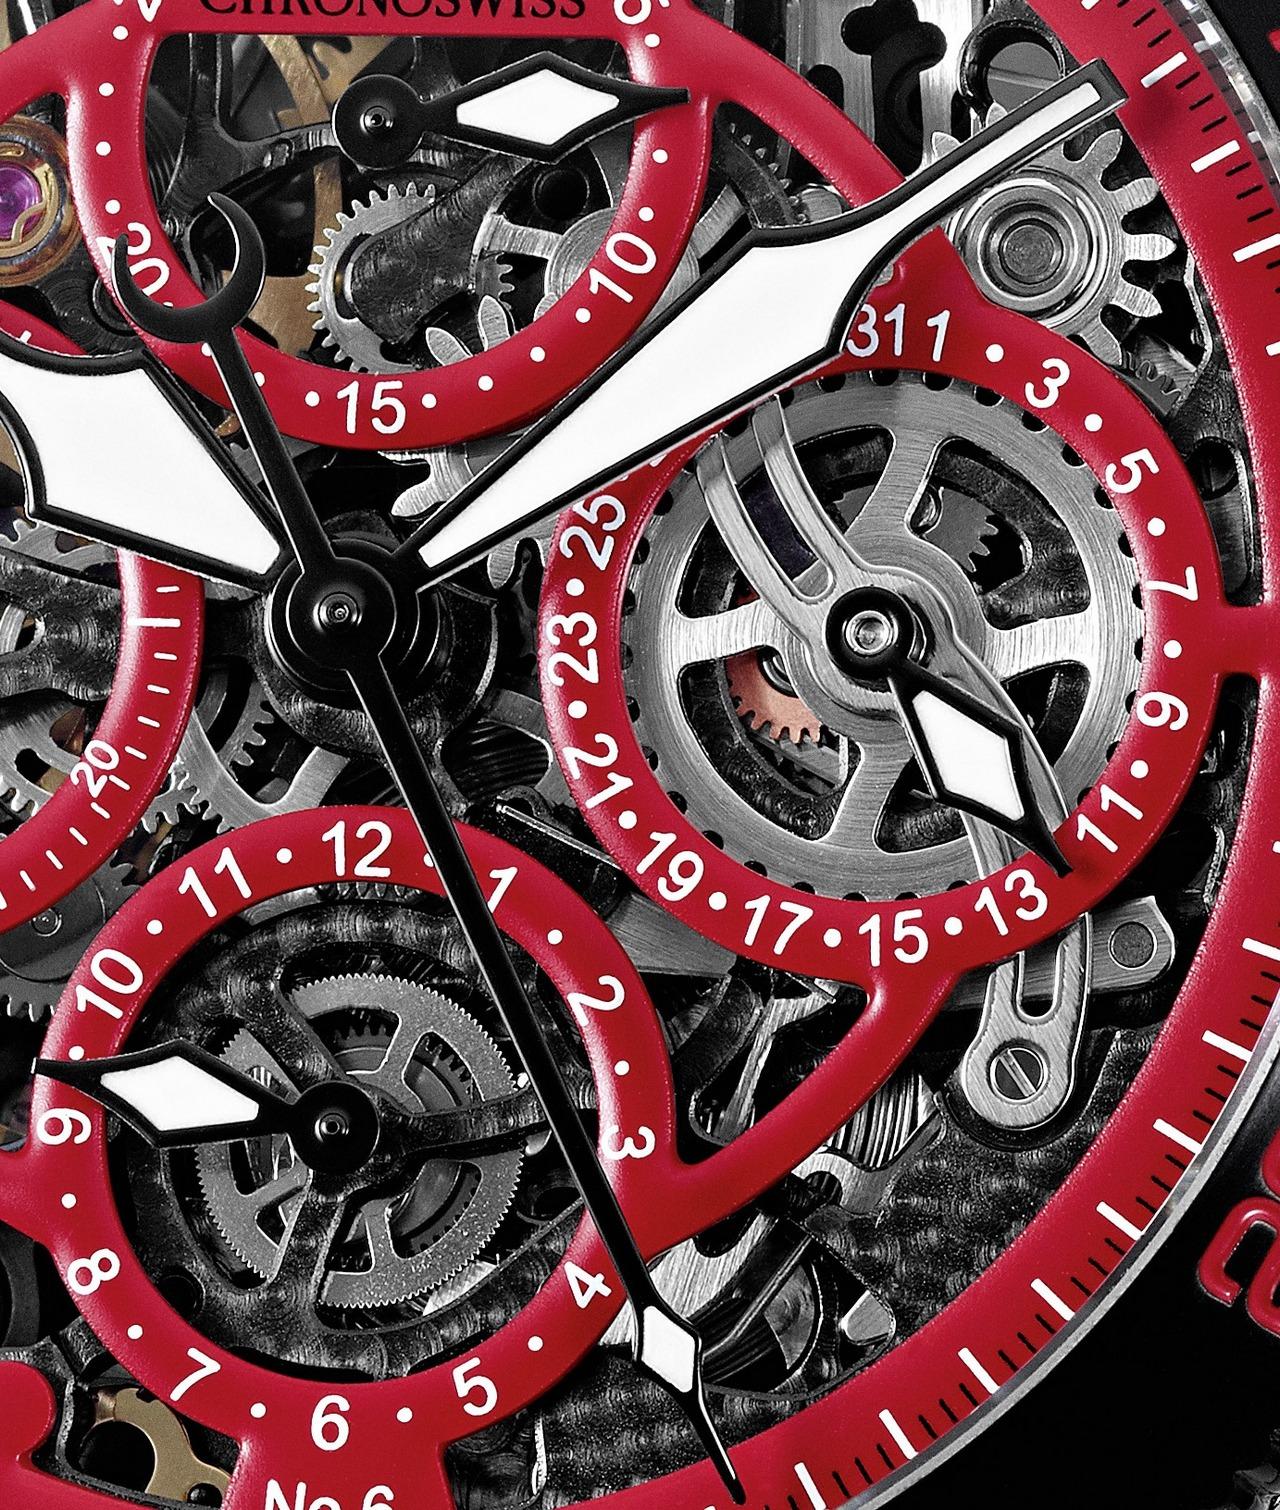 chronoswiss-timemaster-grand-prix-limited-edition_40-100